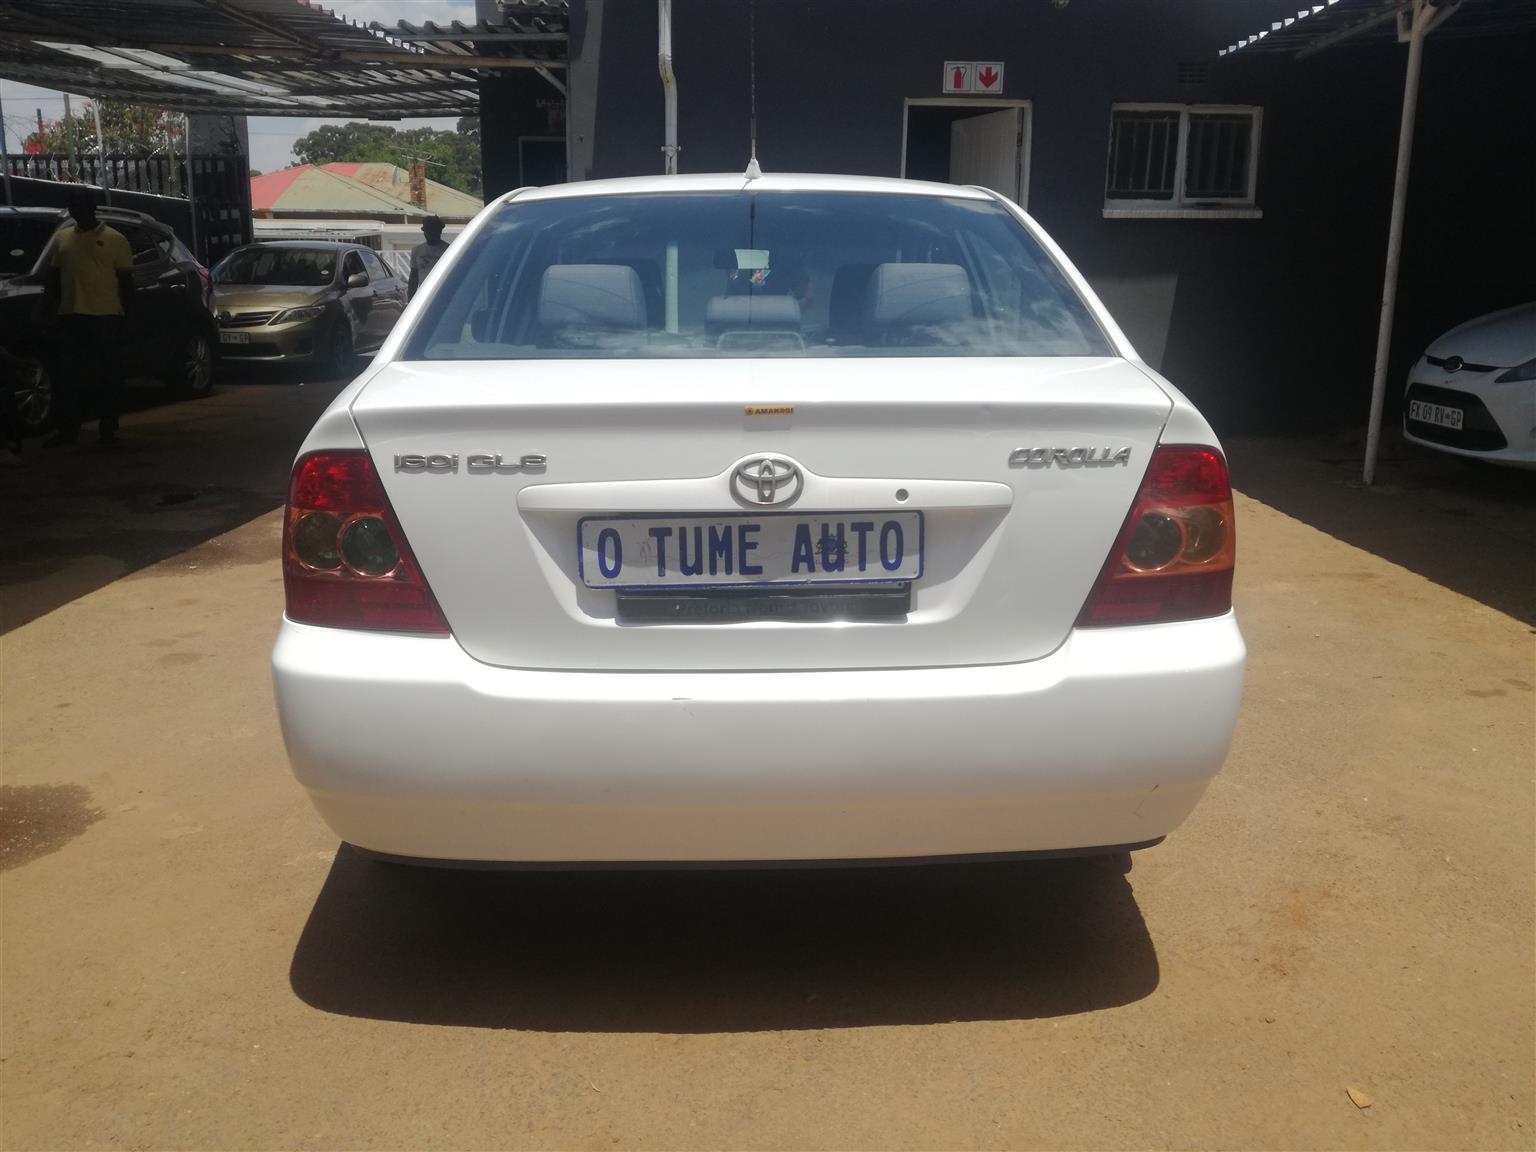 2005 Toyota Corolla 1.6 Advanced Heritage Edition